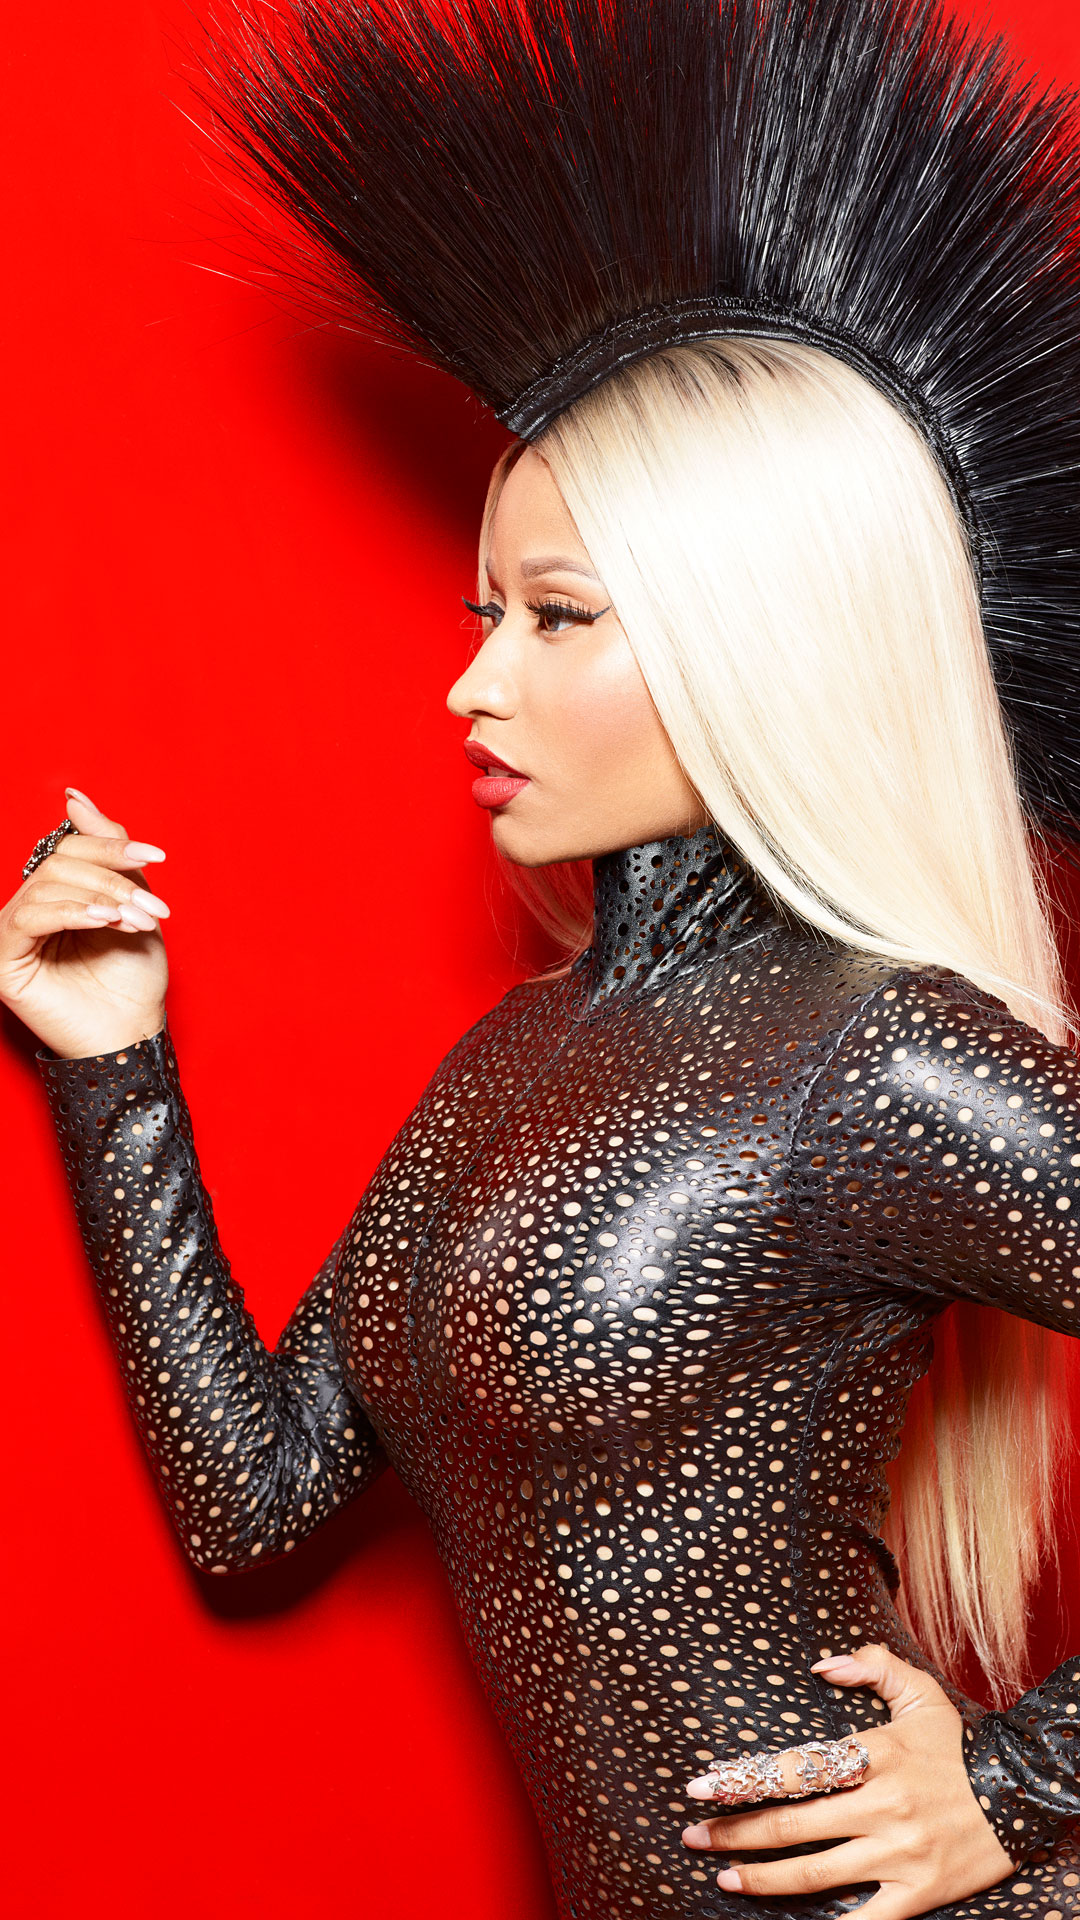 Nicki Minaj Pictures - Nicki Minaj Fashion Photo Shoot